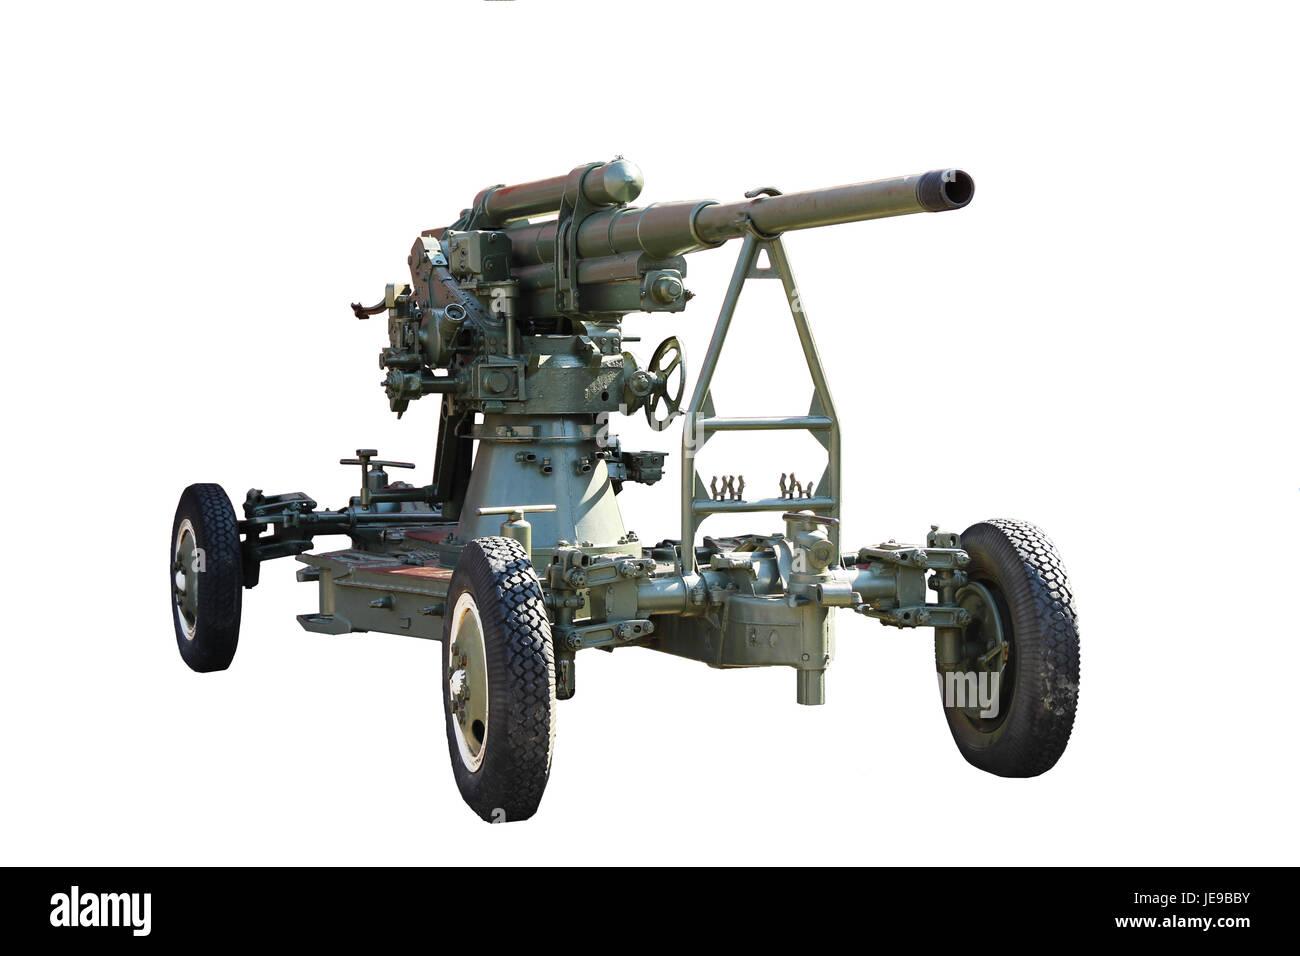 Gun. Anti-aircraft gun on wheels isolated on white background - Stock Image